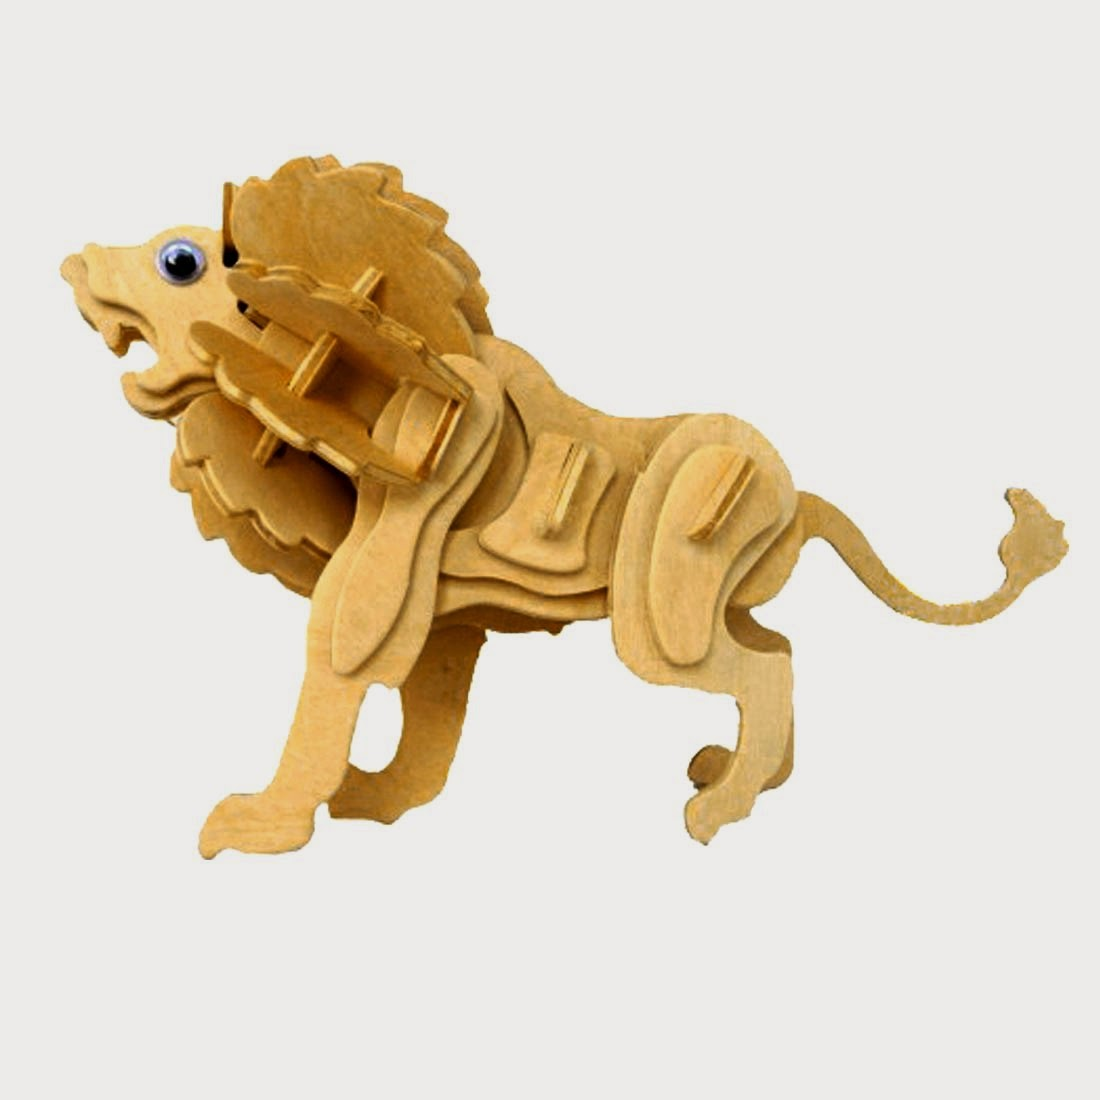 3d Animal Puzzle Wood Craft Art Gift Ideas